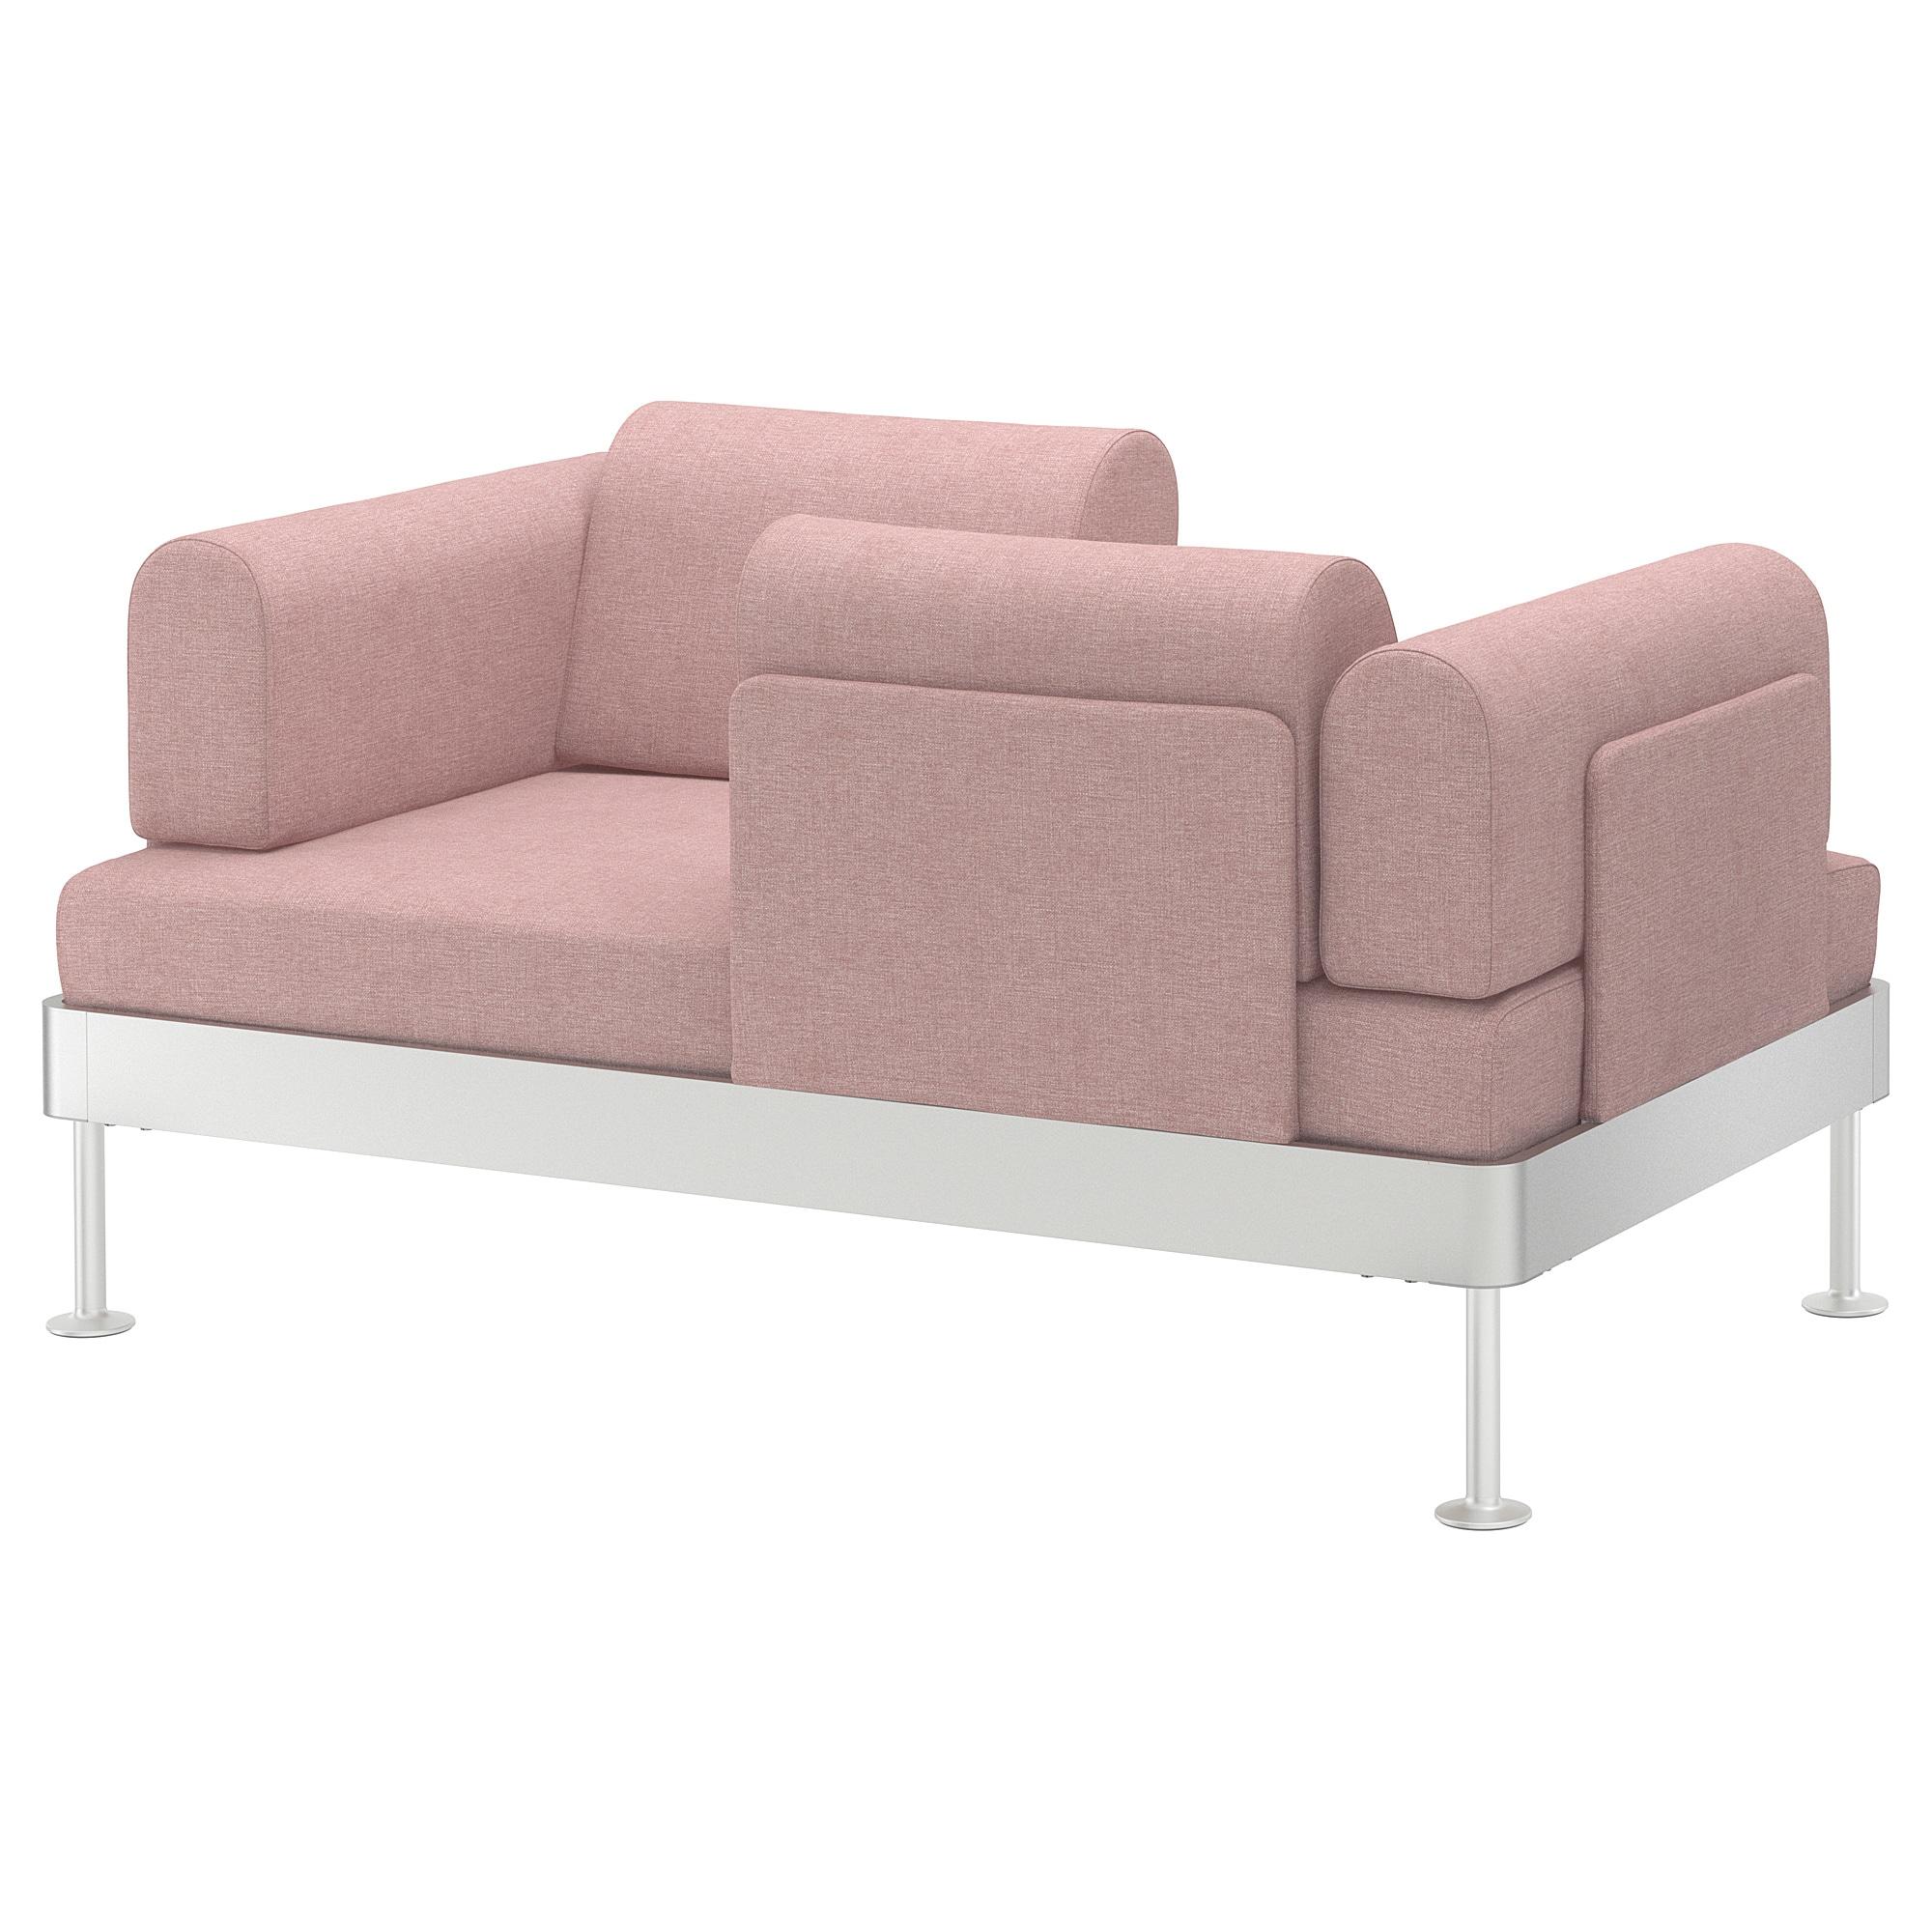 ikea delaktig loveseat gunnared light brown pink in 2019 rh pinterest com